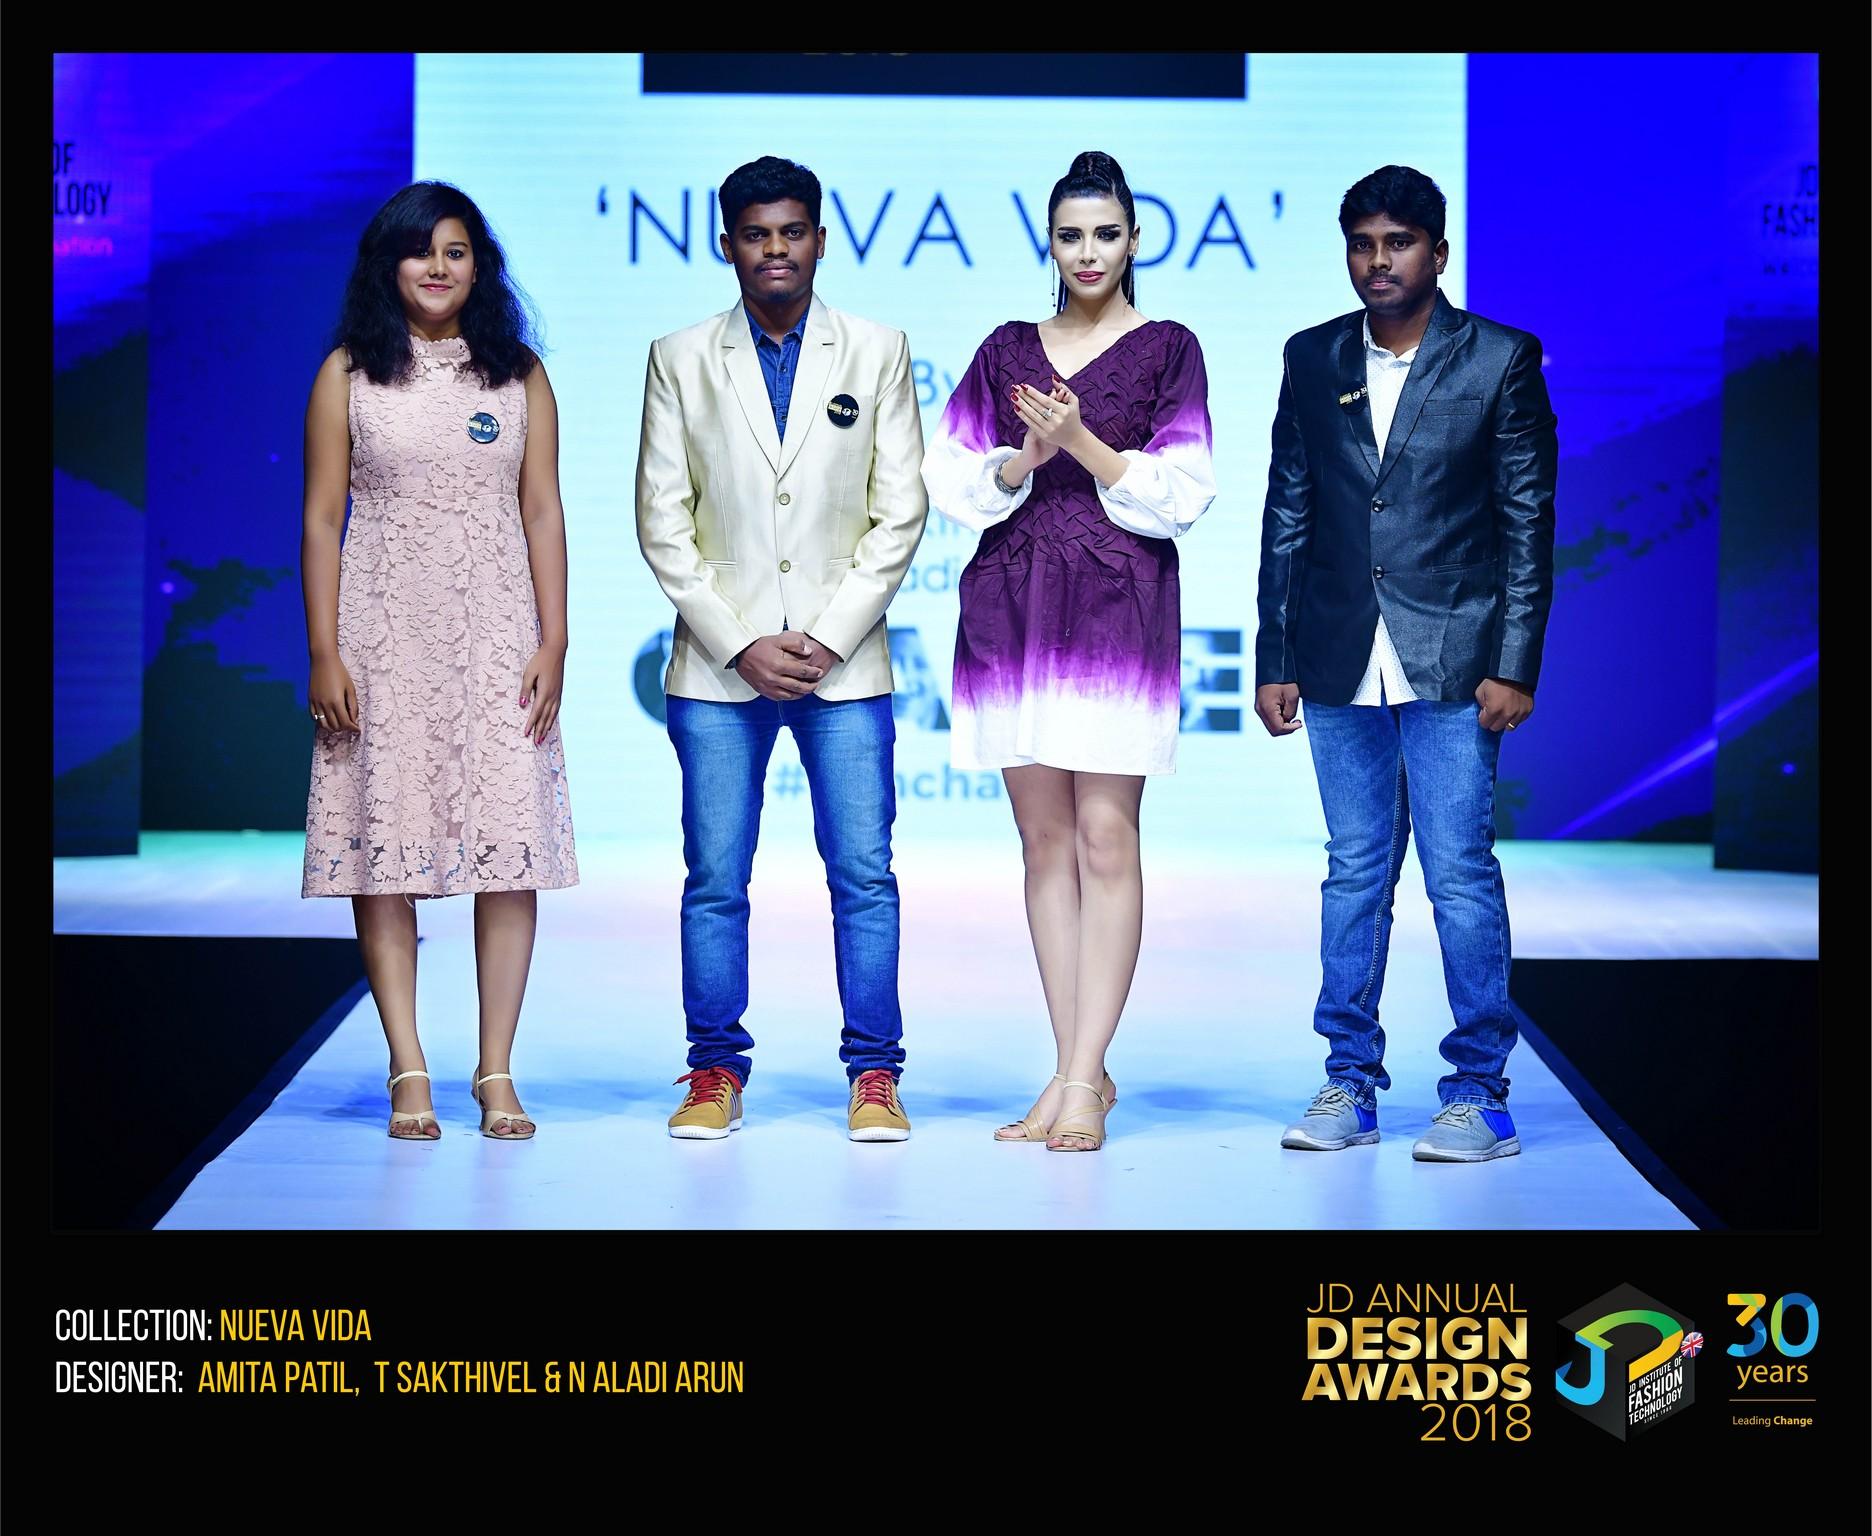 Nueva Vida – Change – JD Annual Design Awards 2018   Designer: Shakthi, Arun and Amitha   Photography : Jerin Nath (@jerin_nath) nueva vida - NUEVA VIDA 8 - Nueva Vida – Change – JD Annual Design Awards 2018